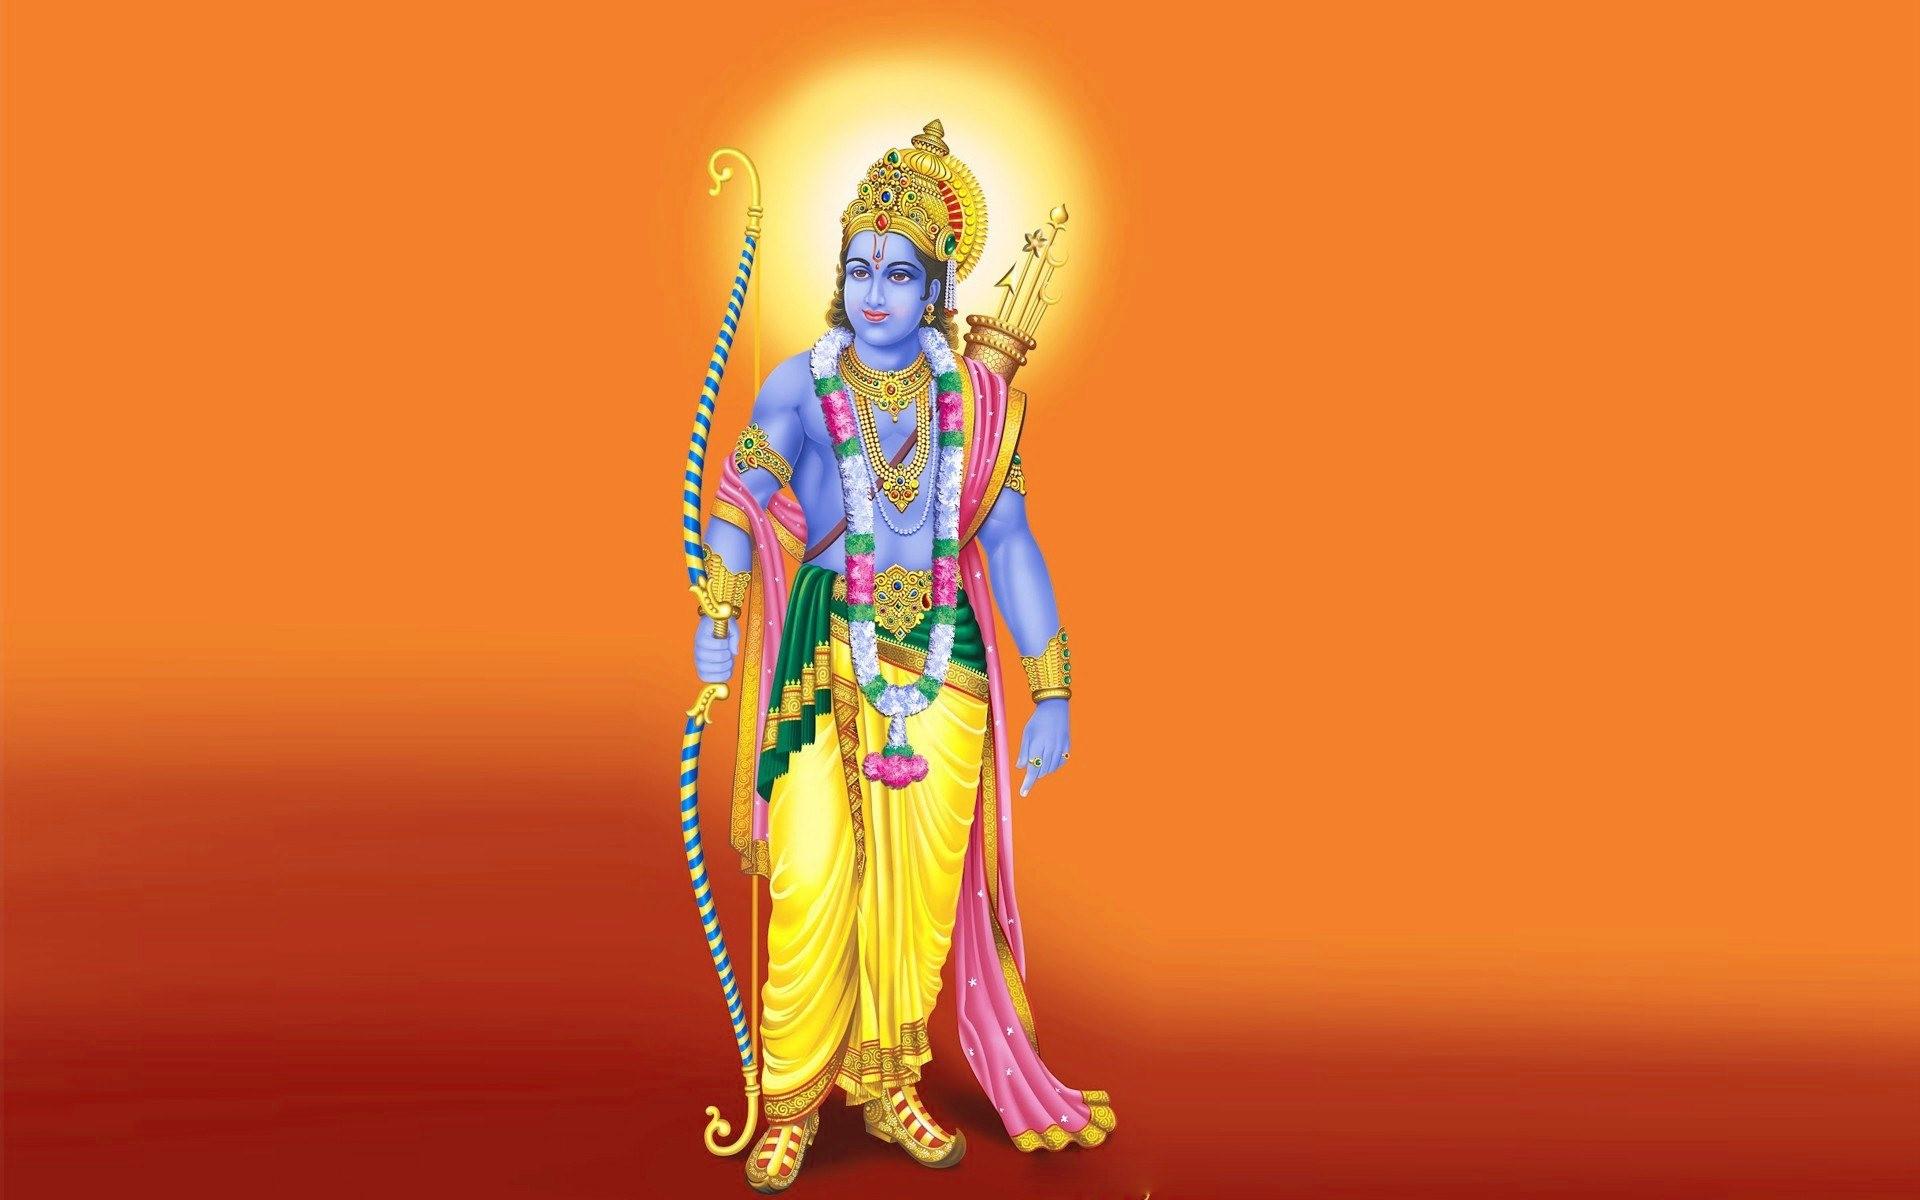 Shri Ram Hindu God Photos Gallery